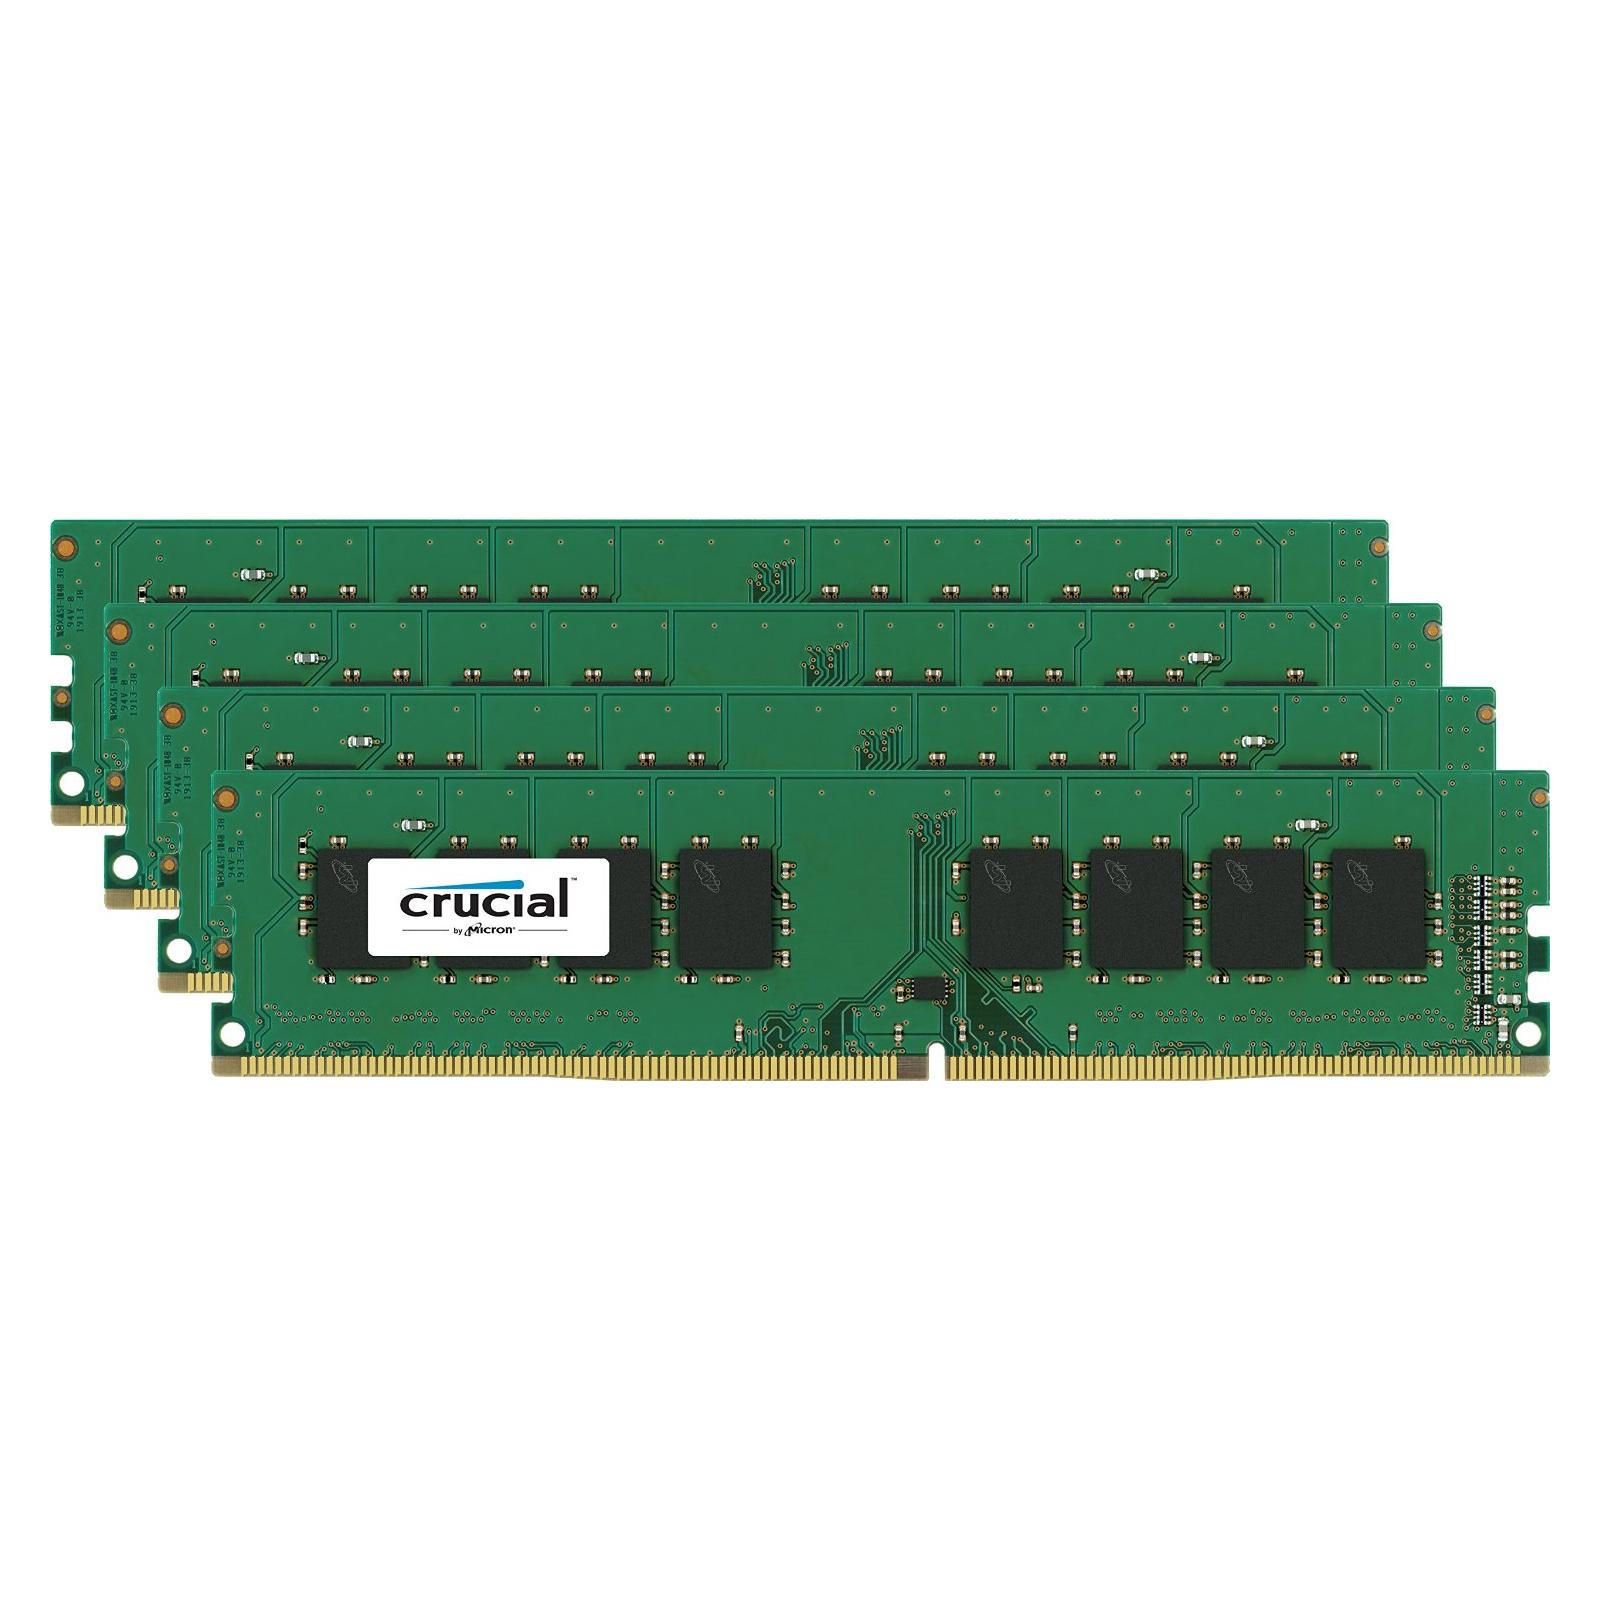 Модуль памяти для компьютера DDR4 32GB (4x8GB) 2133 MHz MICRON (CT4K8G4DFS8213)